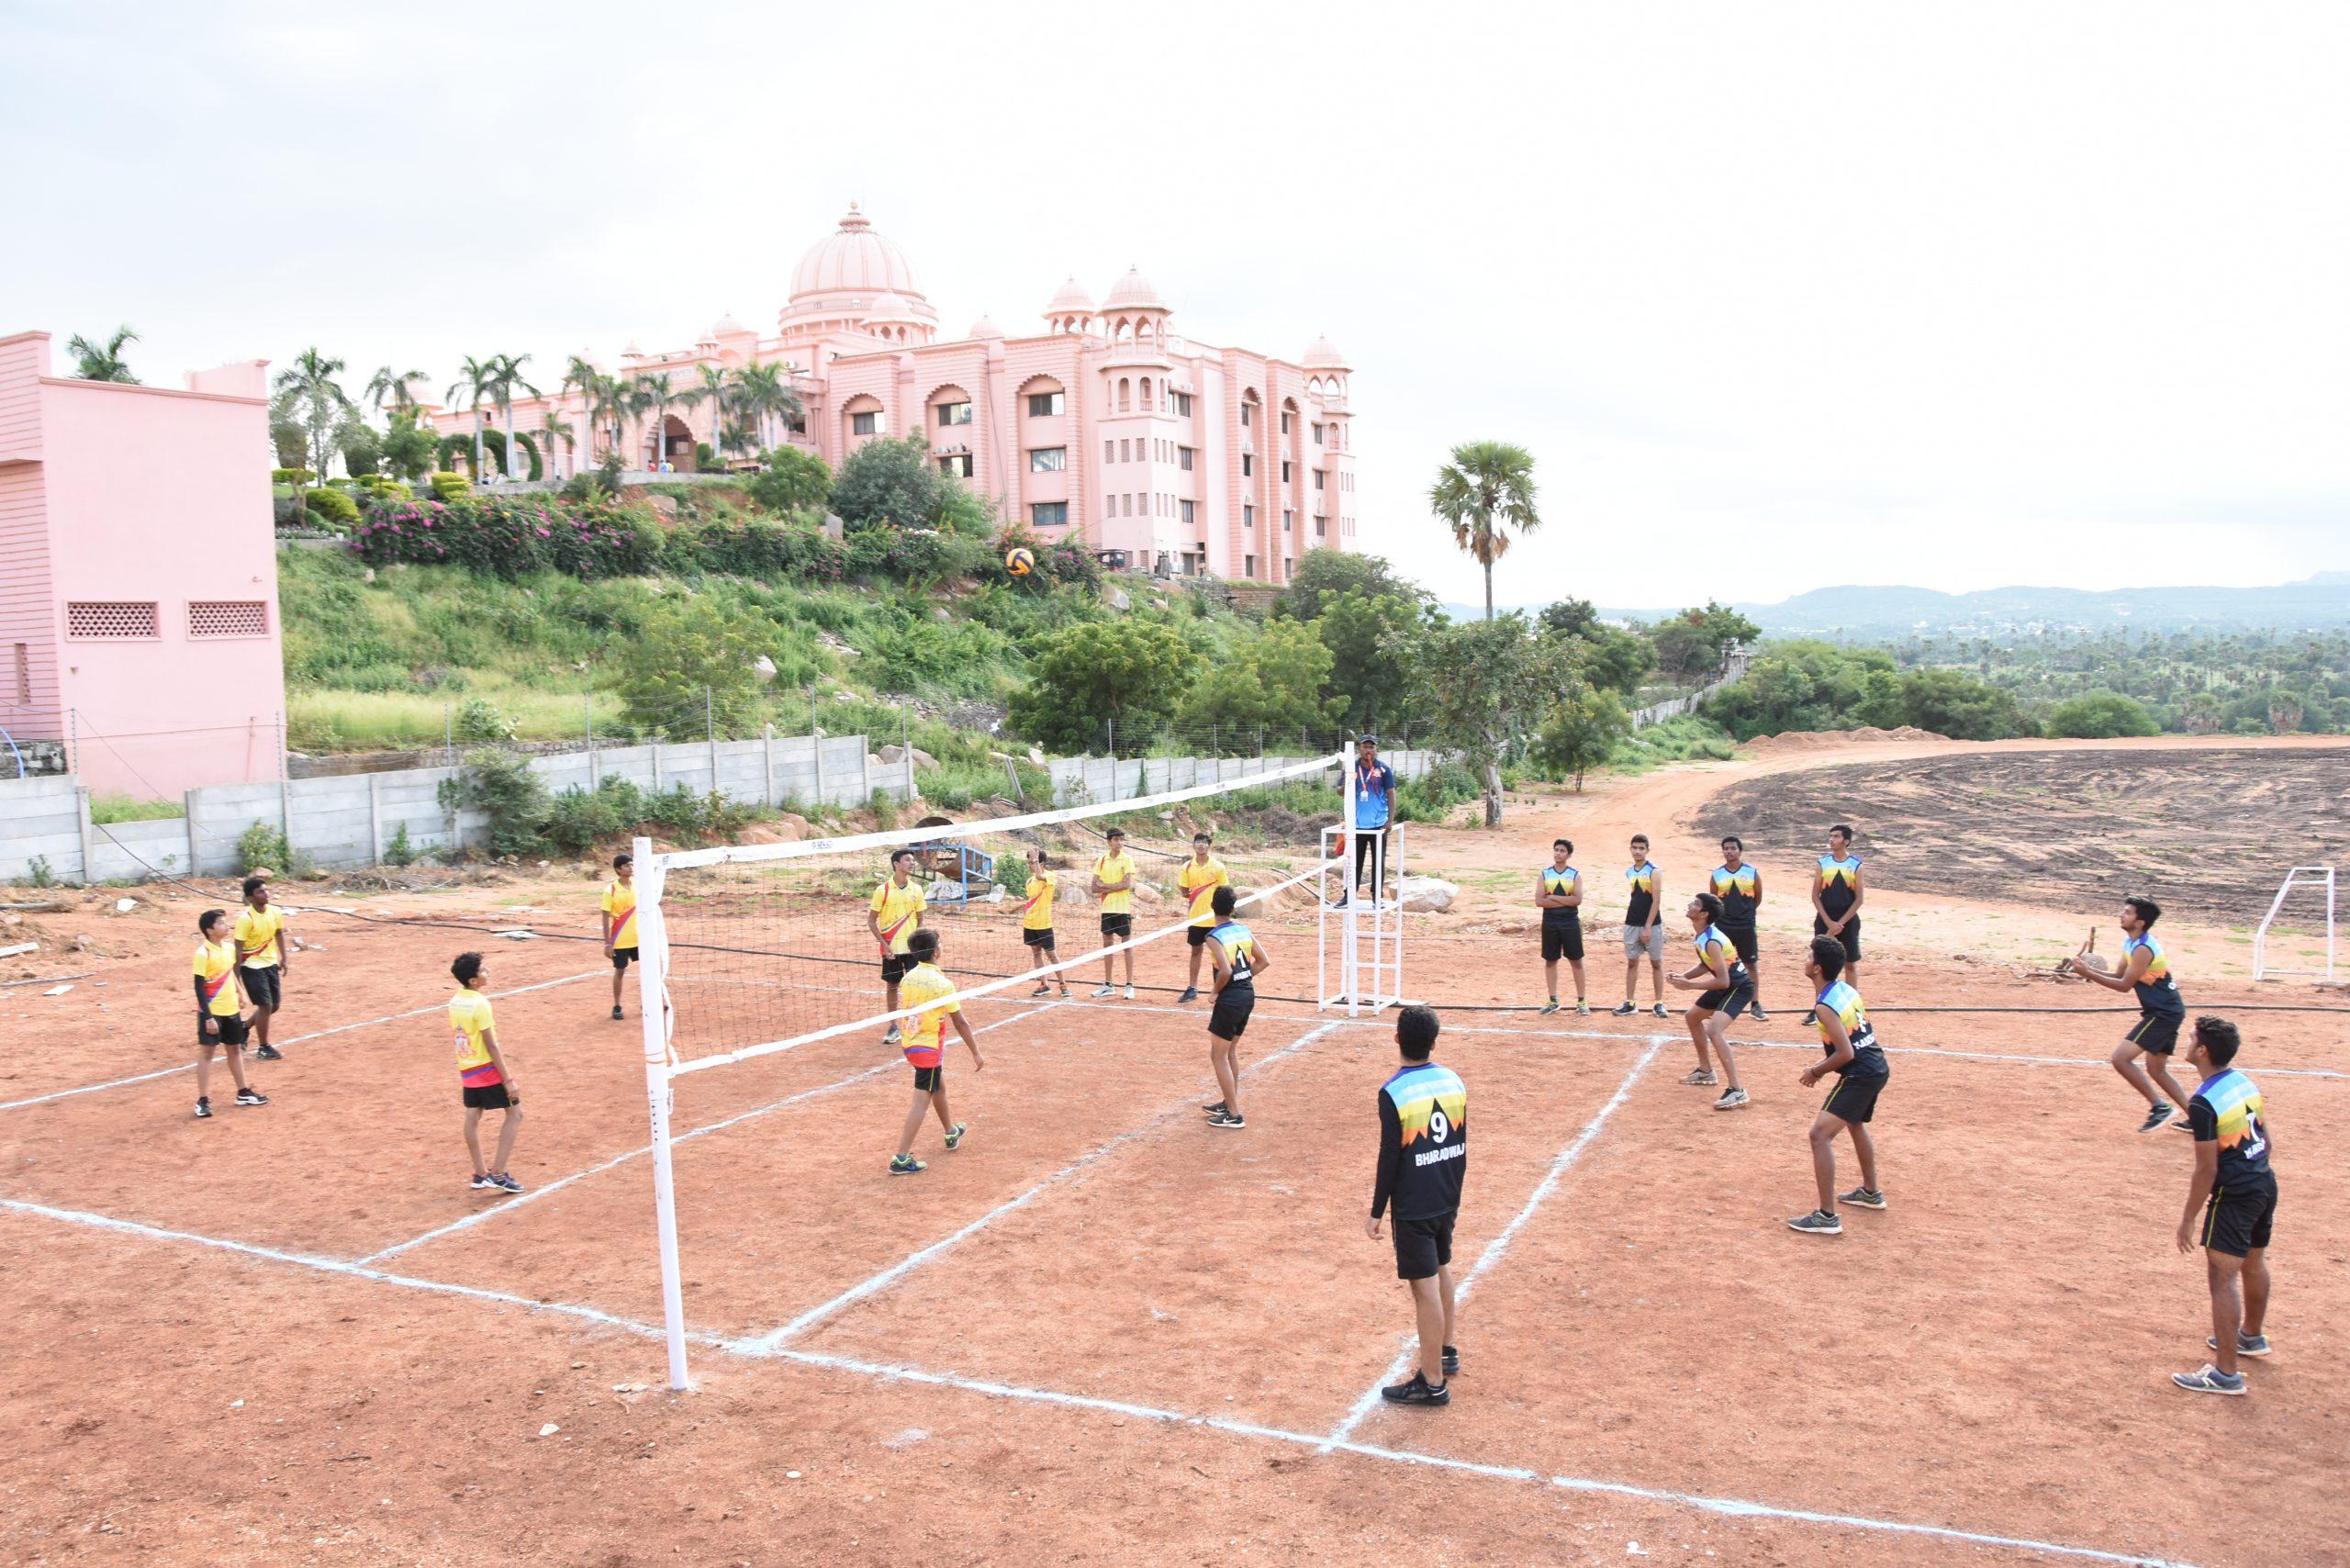 SHREE NEELAKANTH VIDYAPEETH Students Playing Outdoor Games